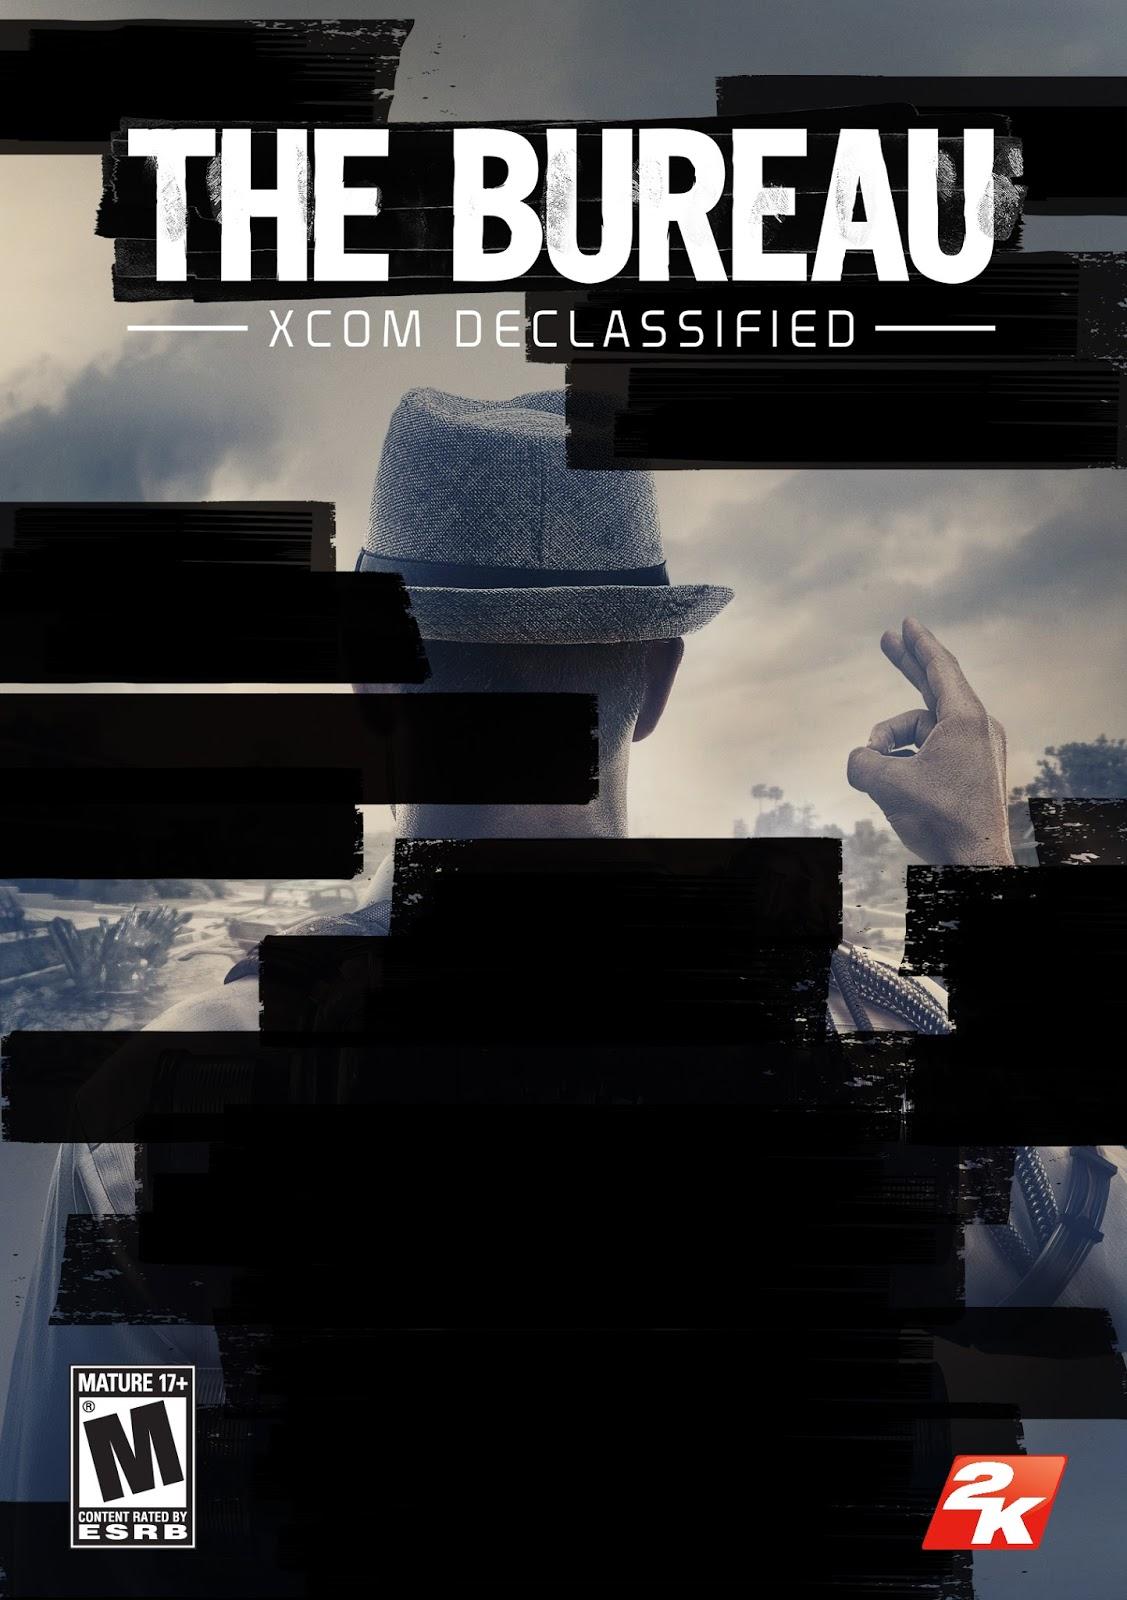 The bureau xcom declassified video game review biogamer girl - Xcom bureau declassified ...